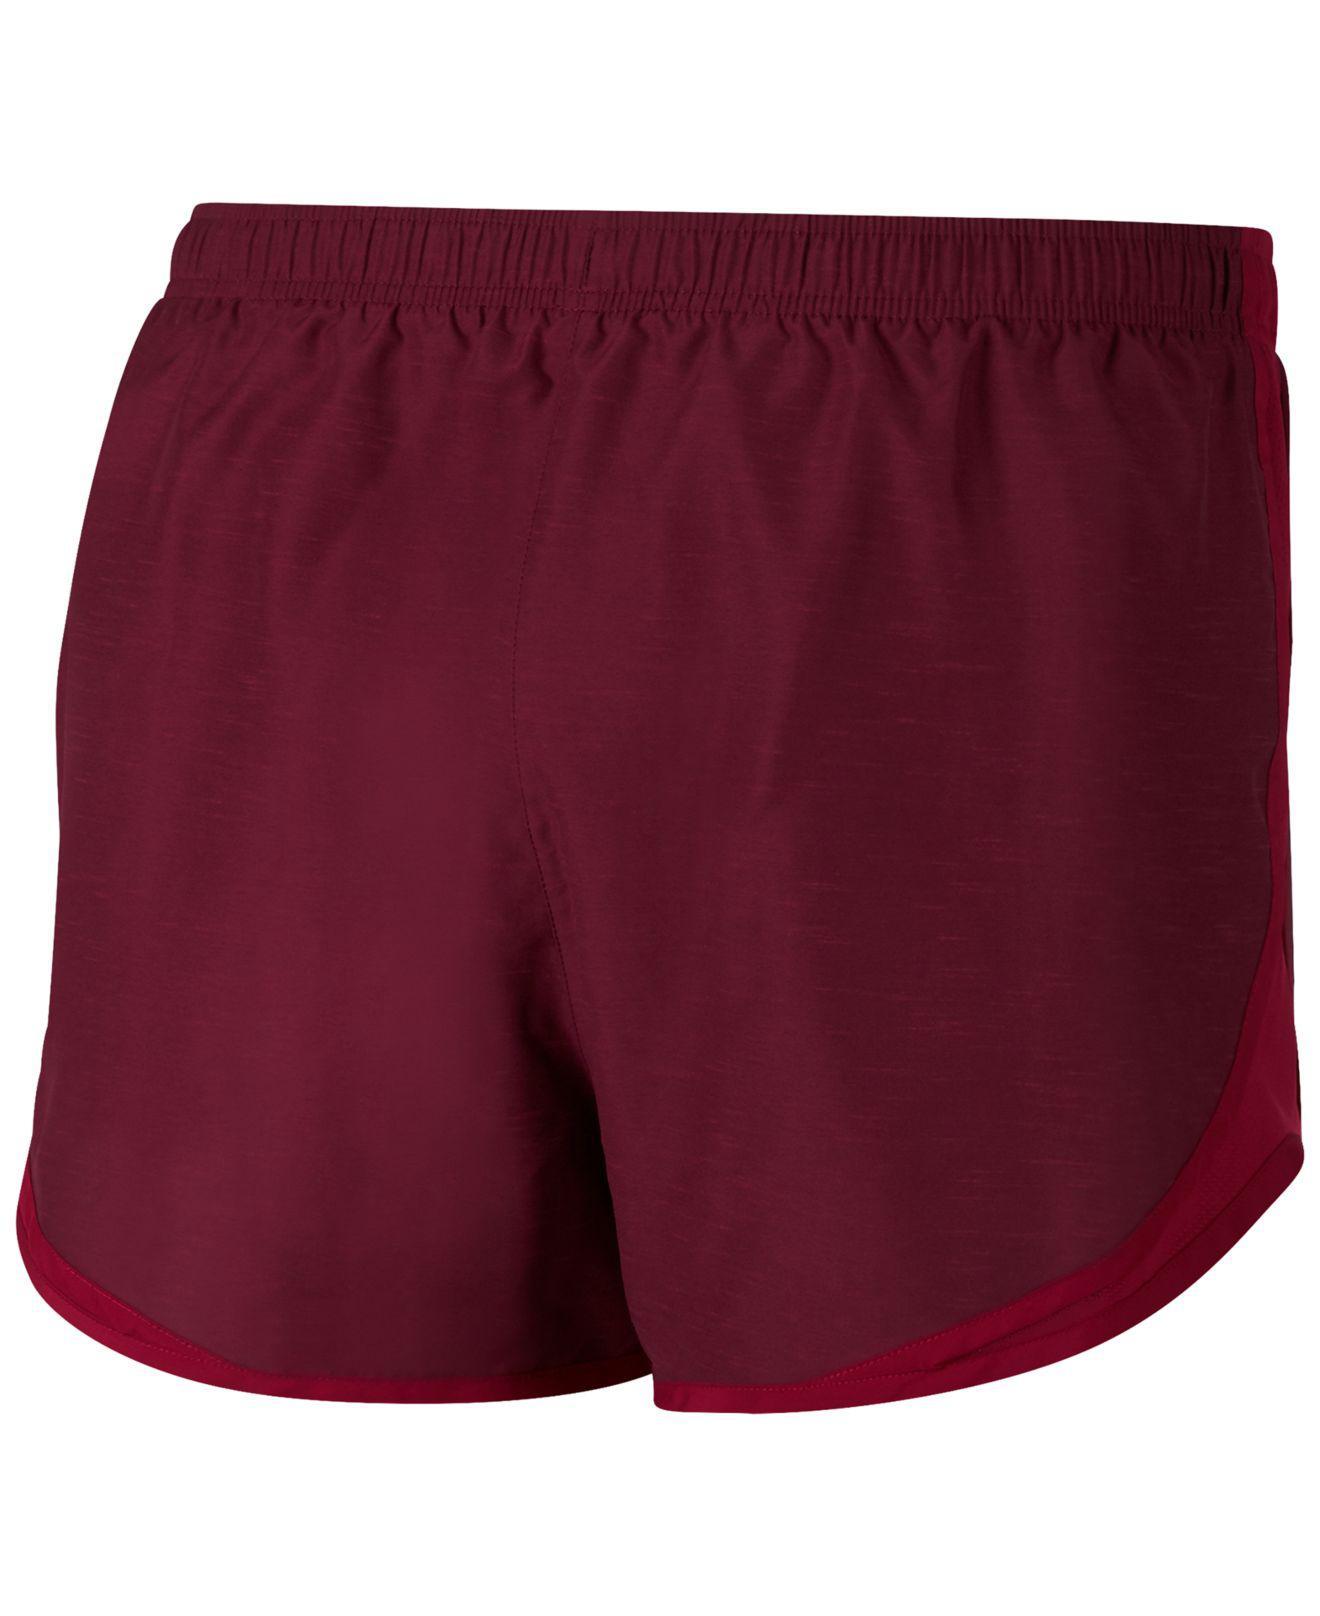 04c3fb5d7a2 Nike - Purple Plus Size Tempo Dri-fit Track Shorts for Men - Lyst. View  fullscreen